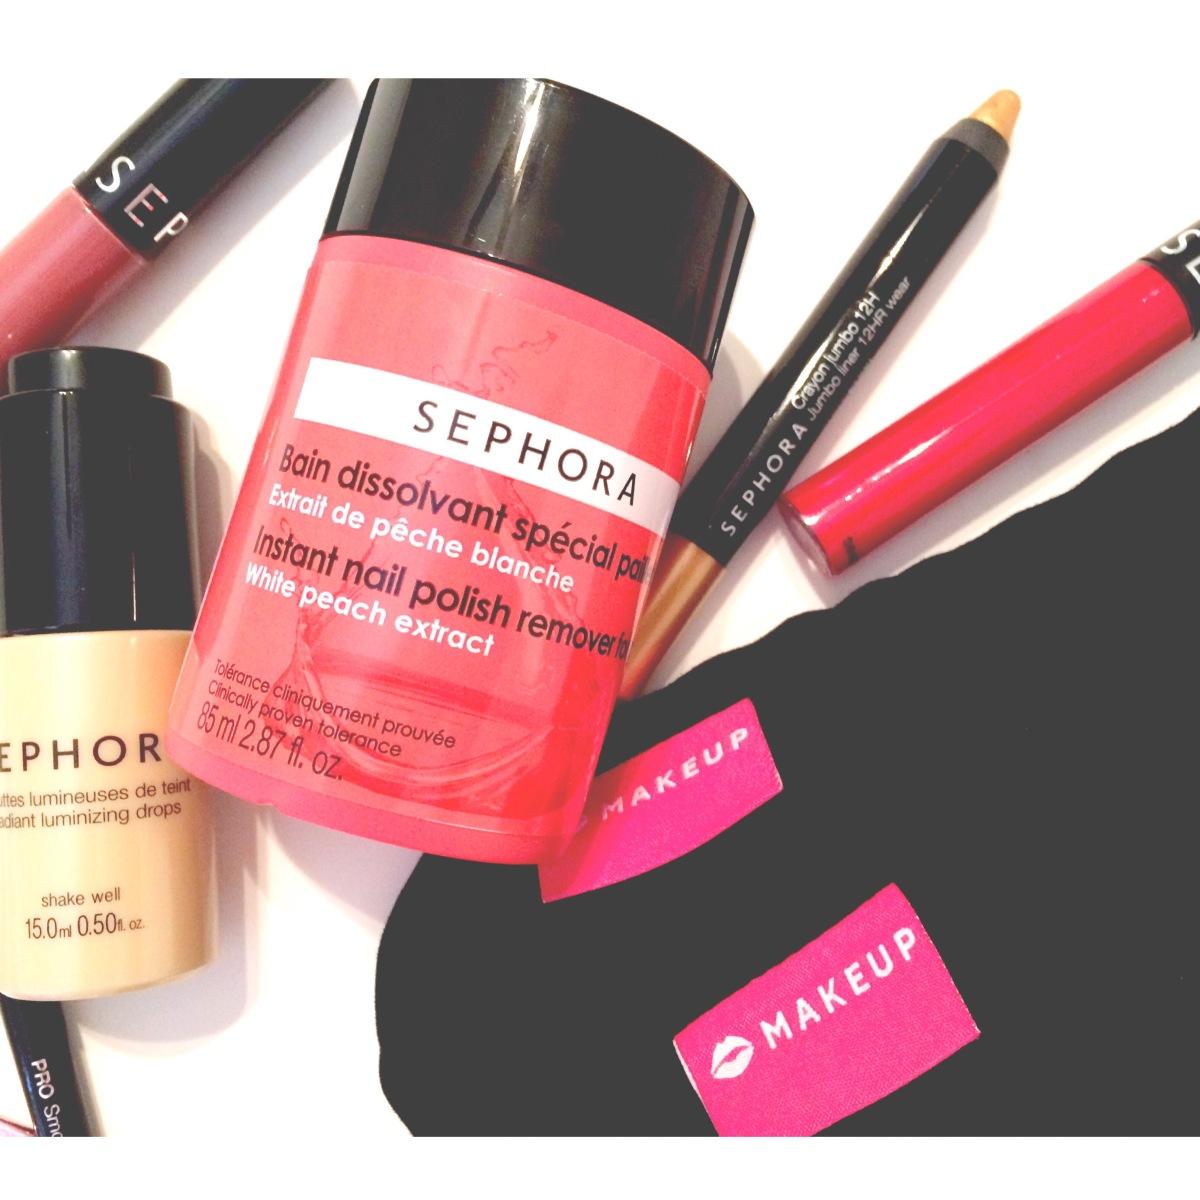 Brand Focus : SephoraCollection